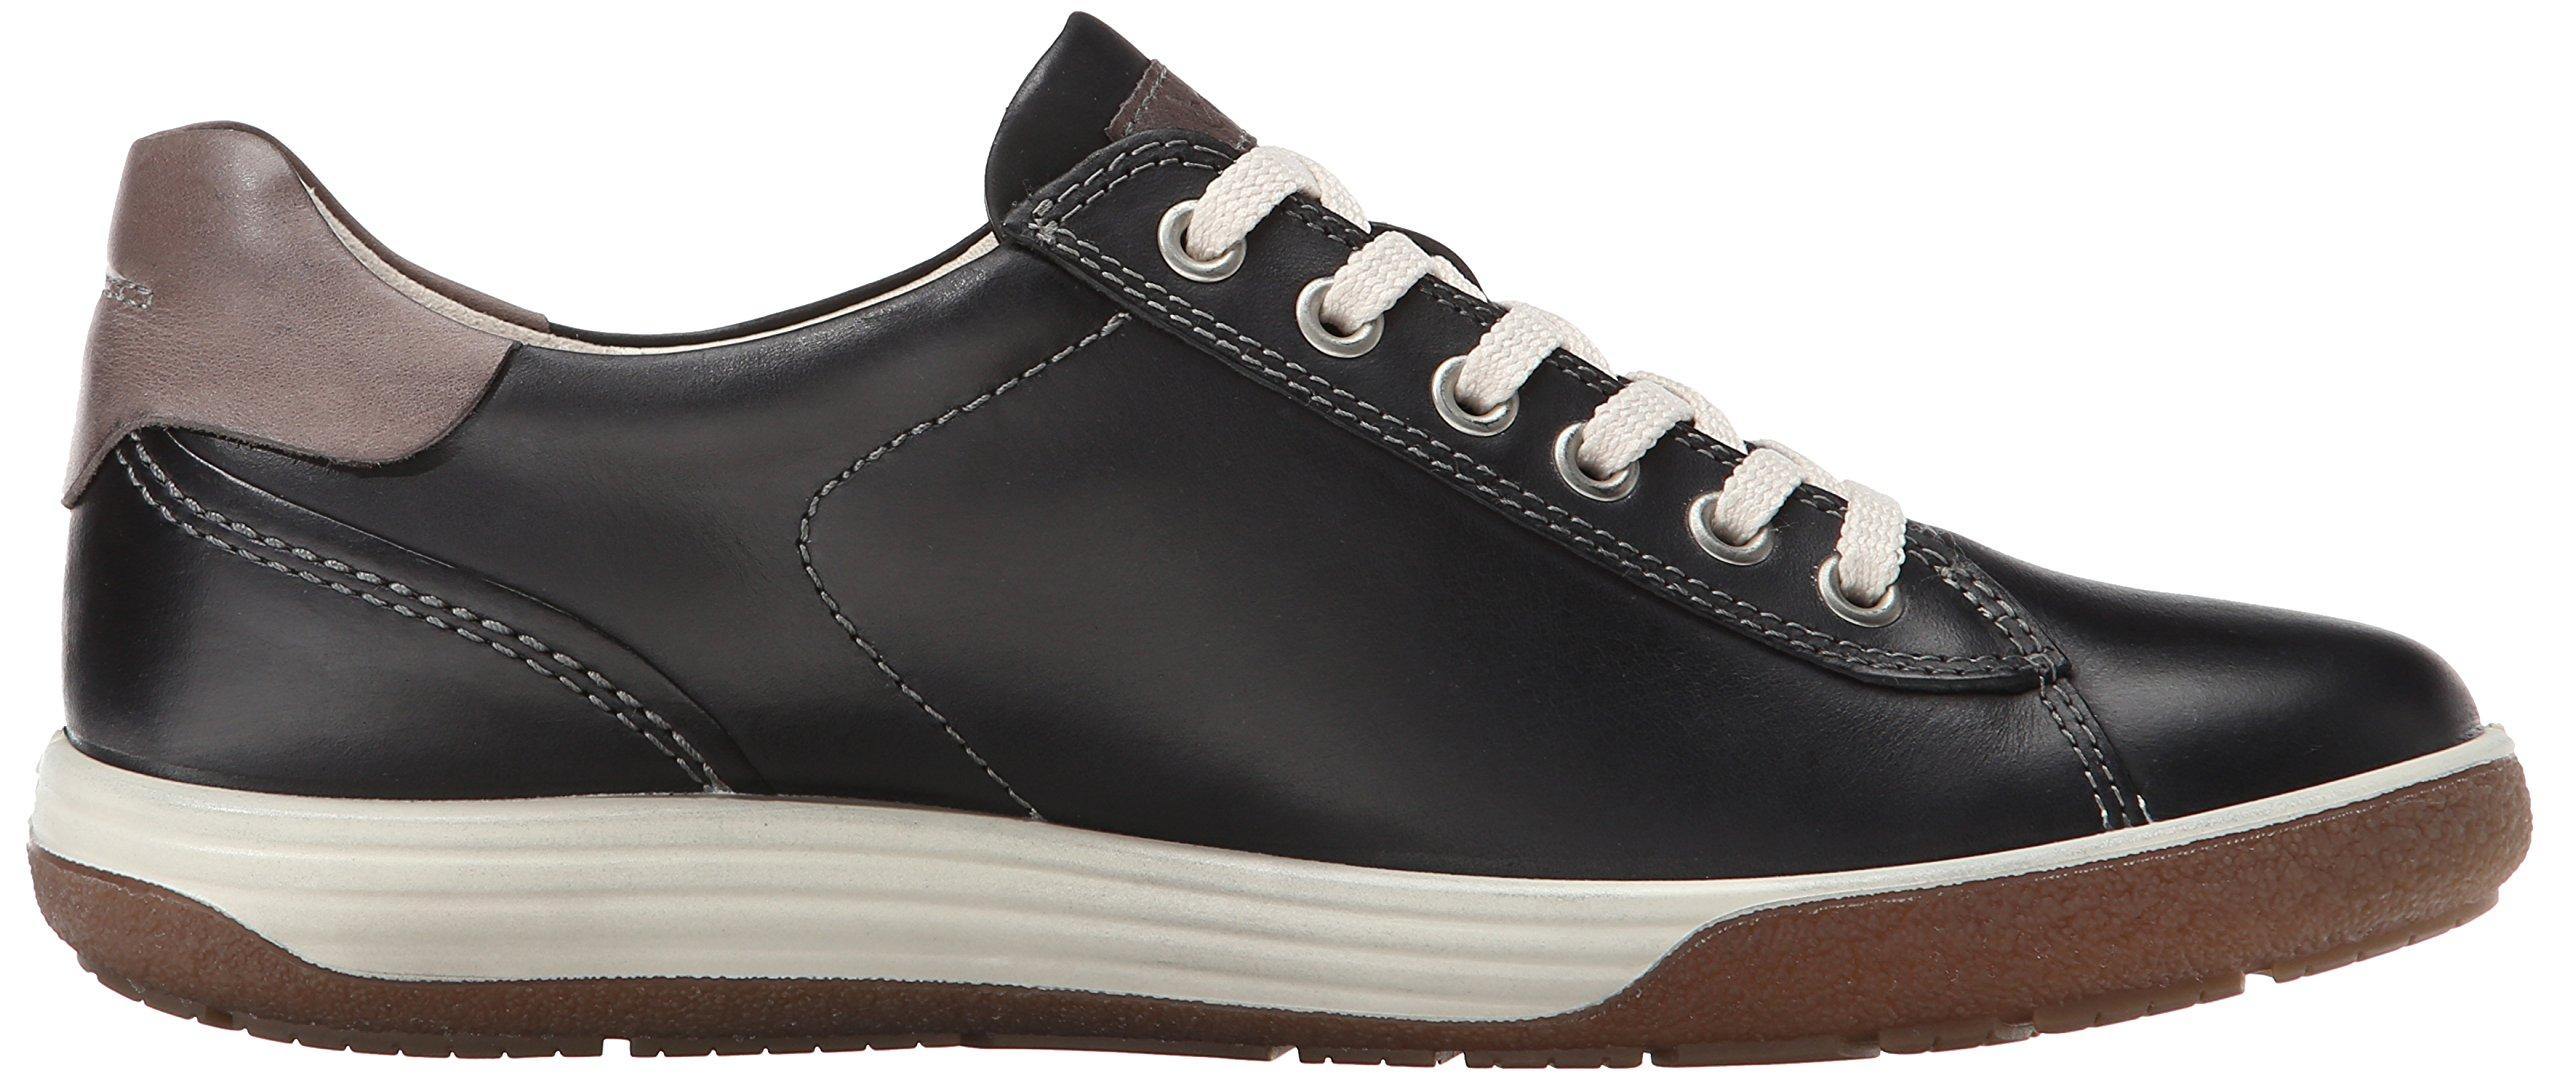 Ecco Footwear Womens Chase II Lace Shoe, Black, 39 EU/8-8.5 M US by ECCO (Image #7)